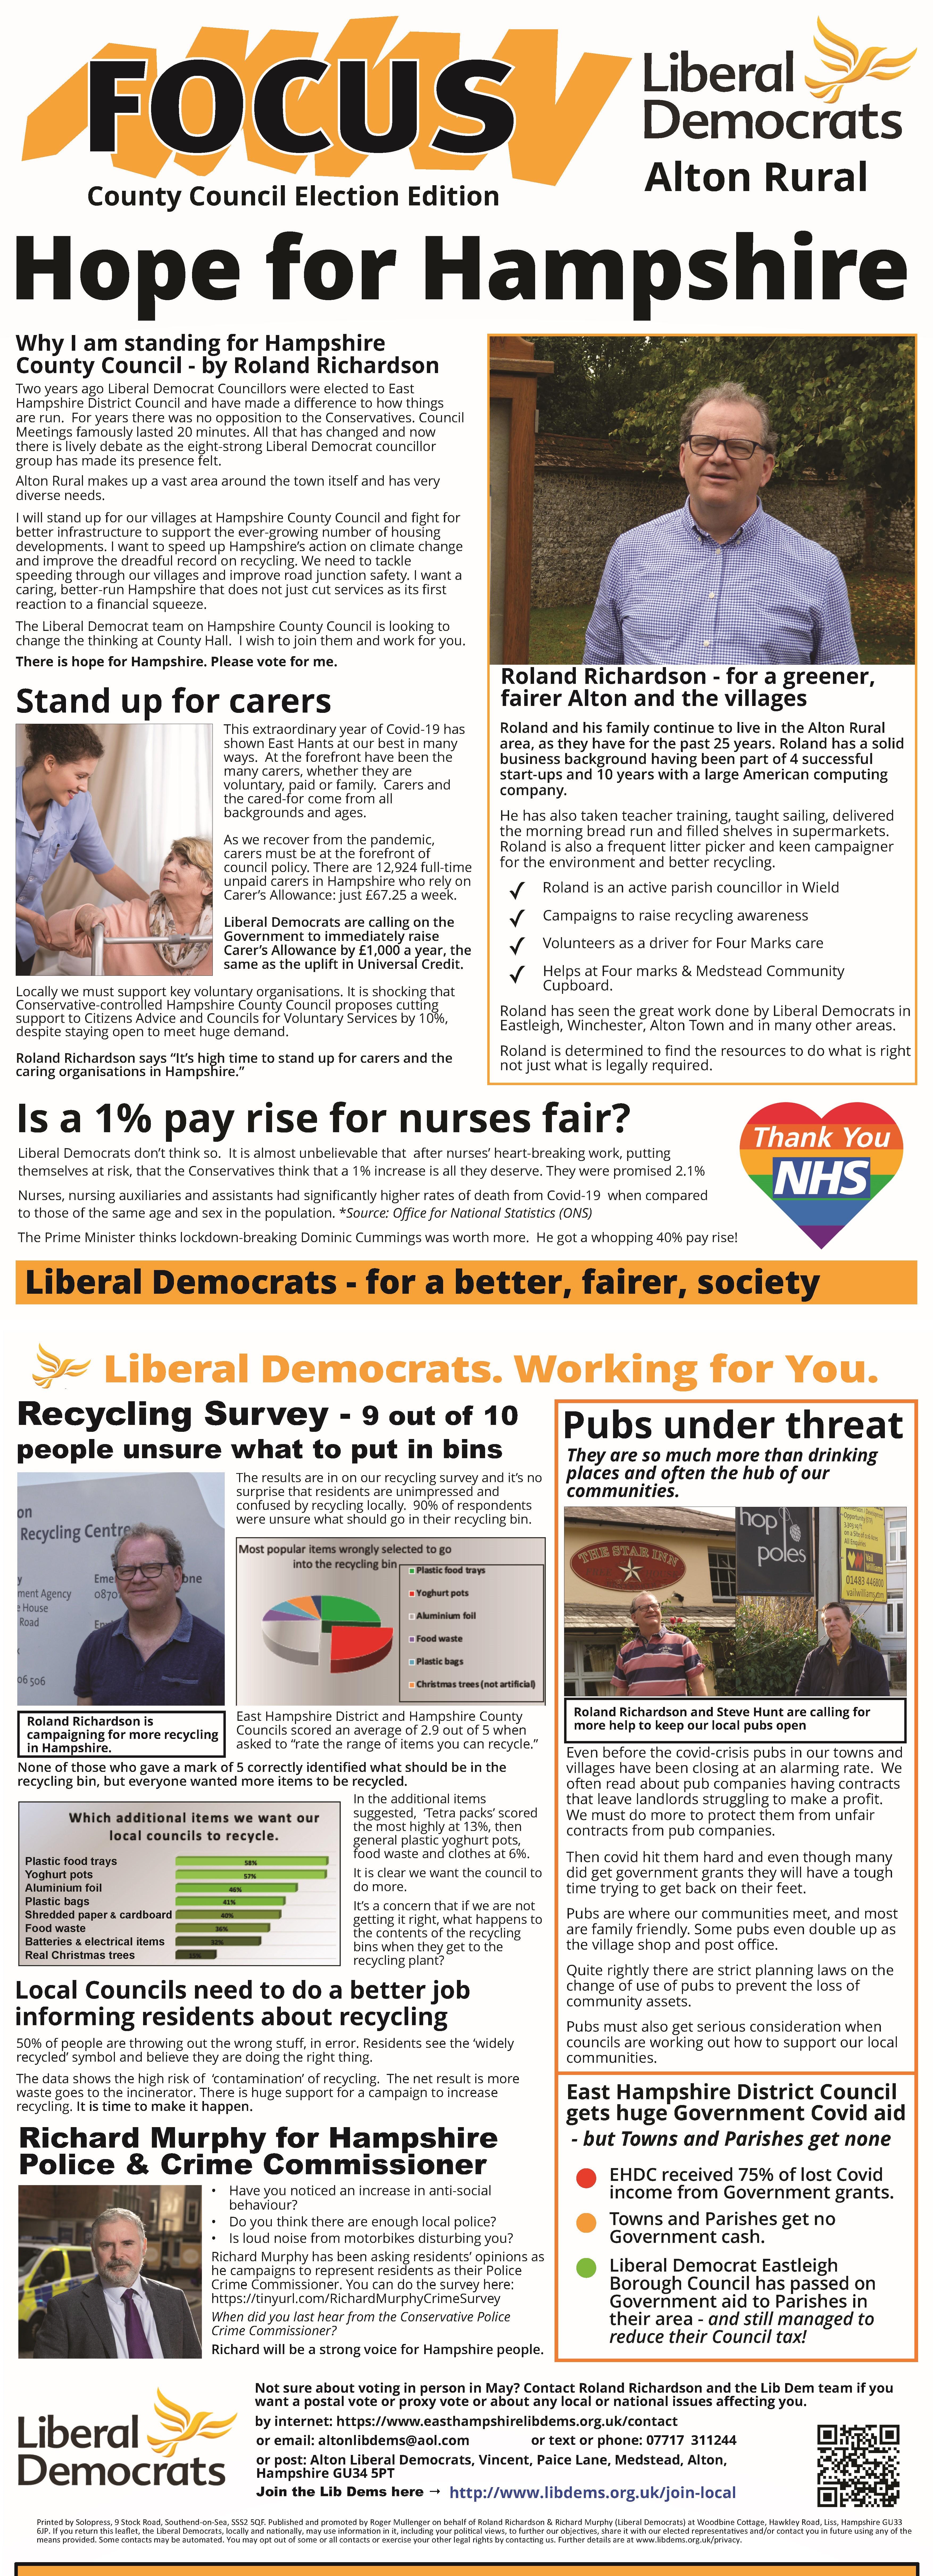 PRINT__A3_Alton_Rural_Election_Edition_2021_Page_1_2.jpg